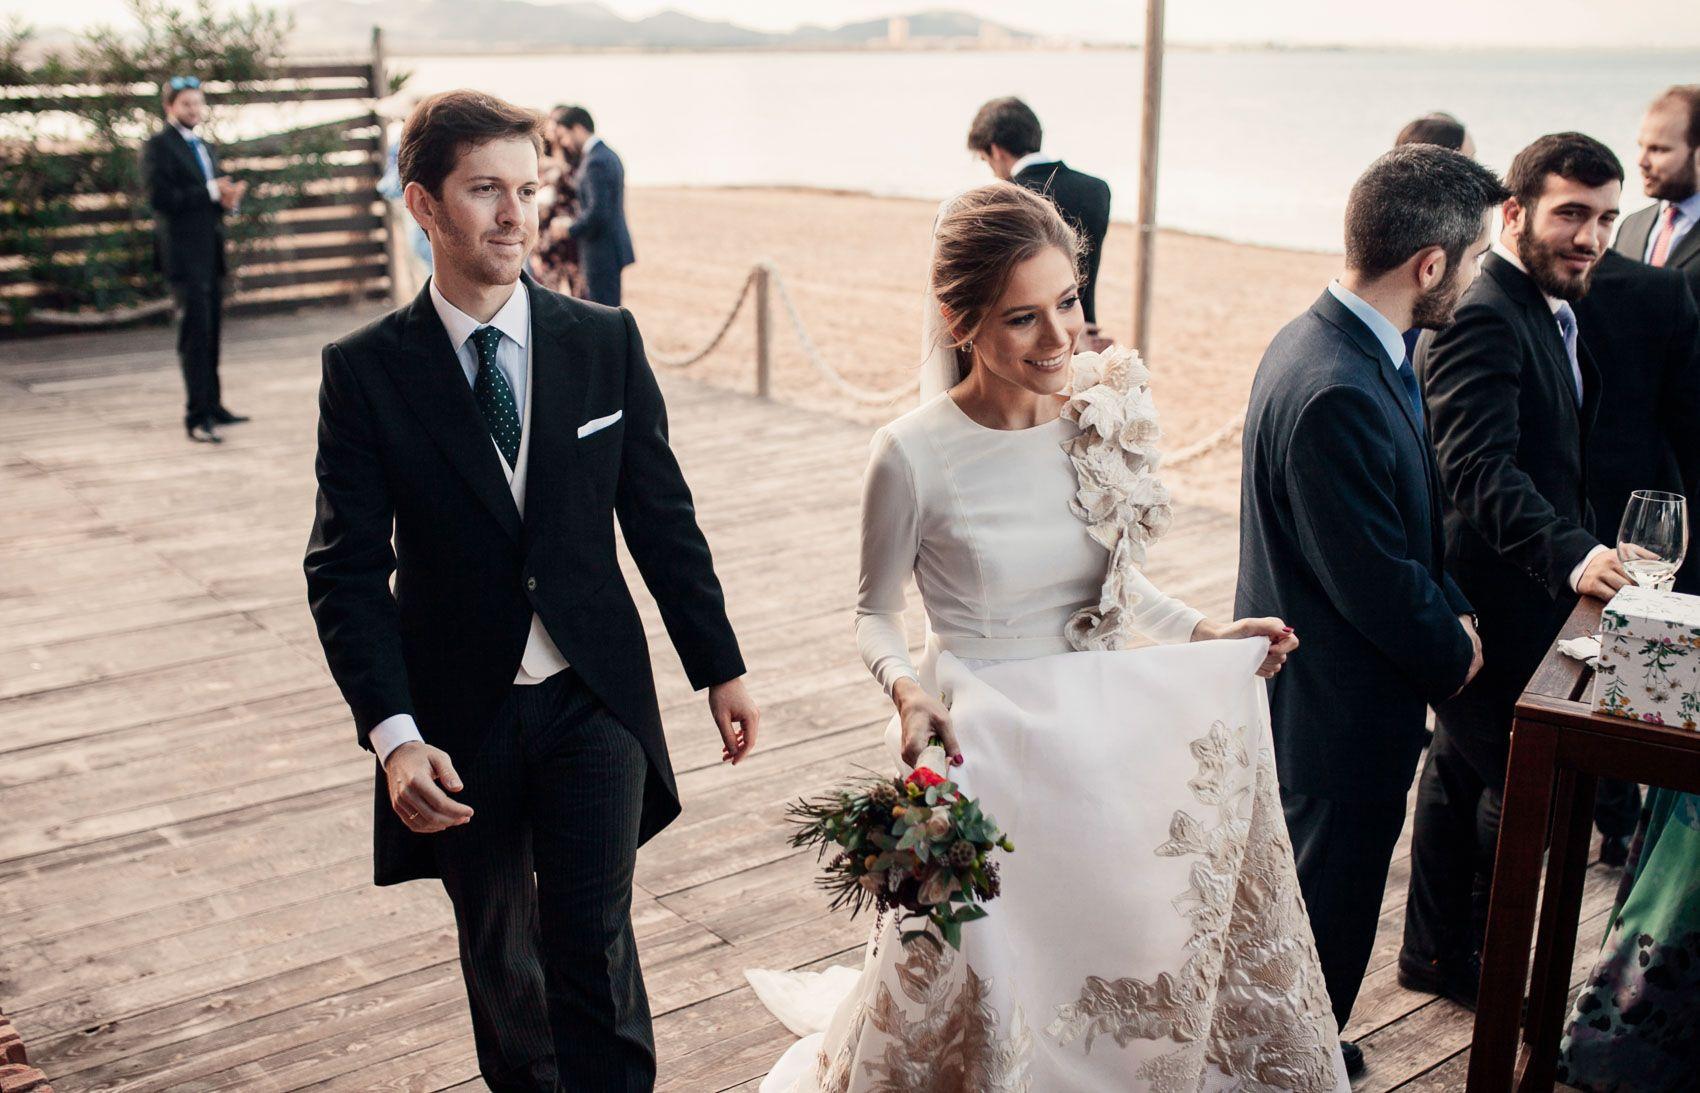 Fernando Claro vestido de novia con bordados dorados